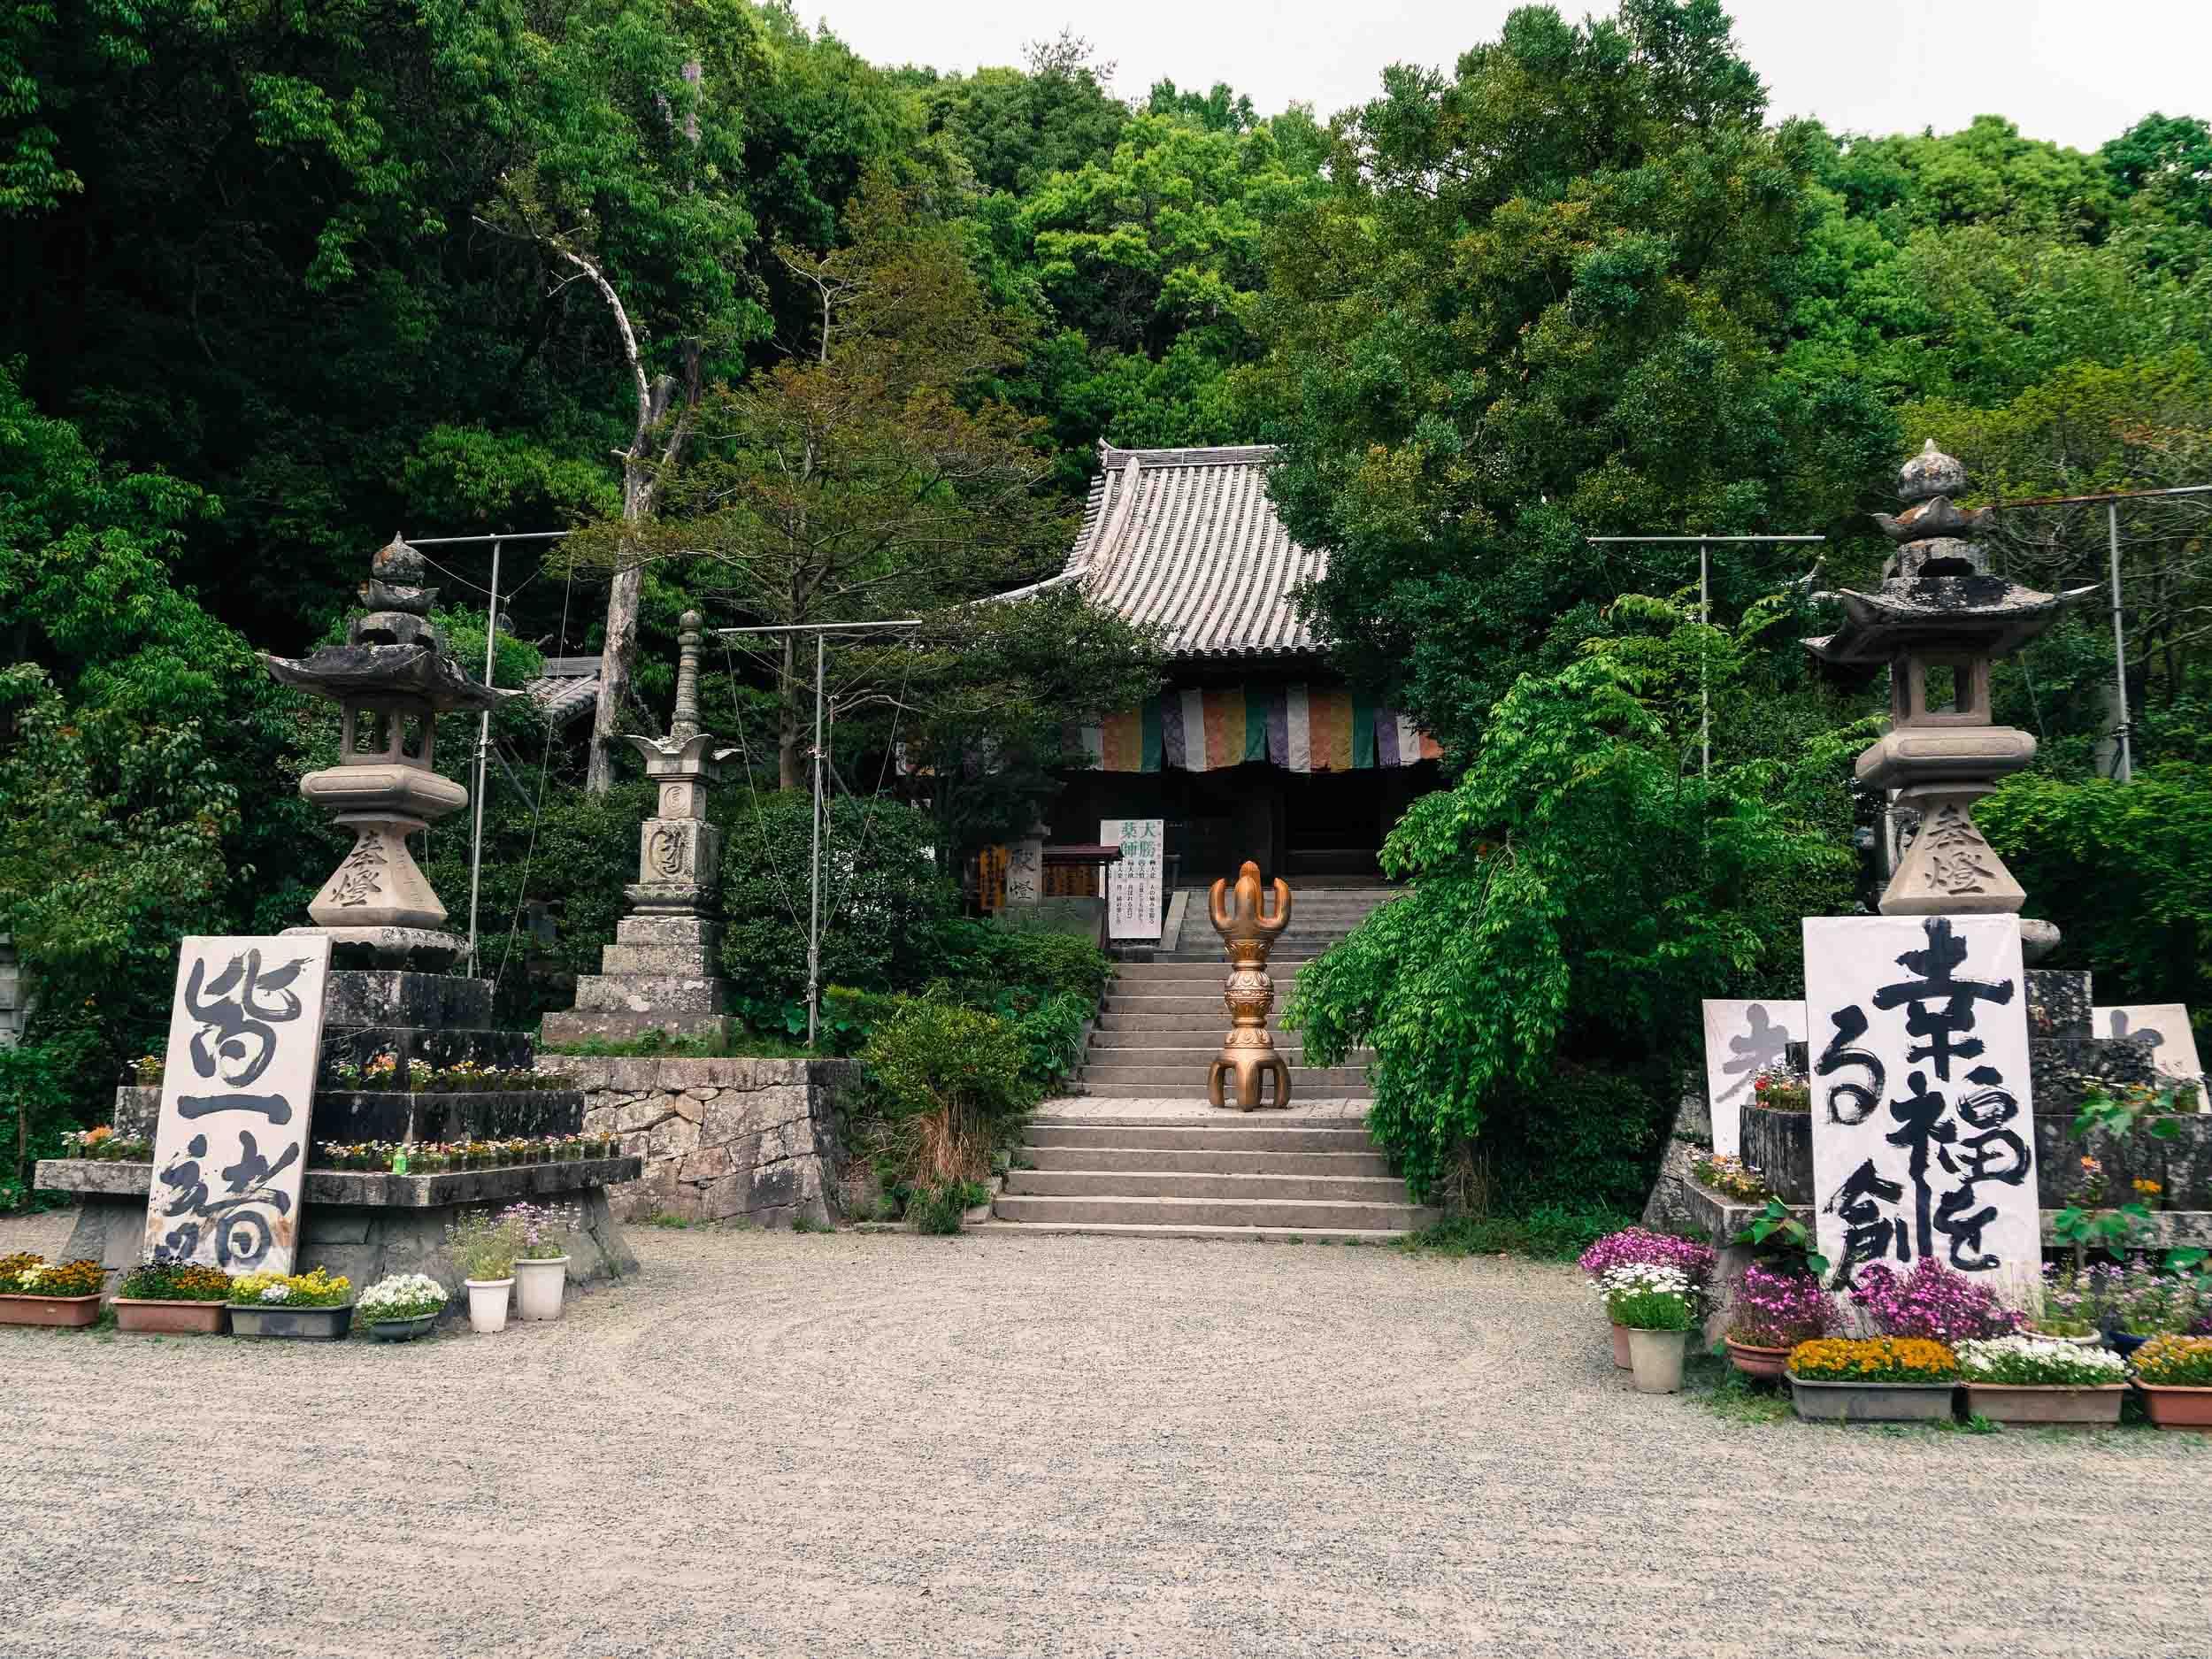 matsuyama-dougo-onsen-57.jpg